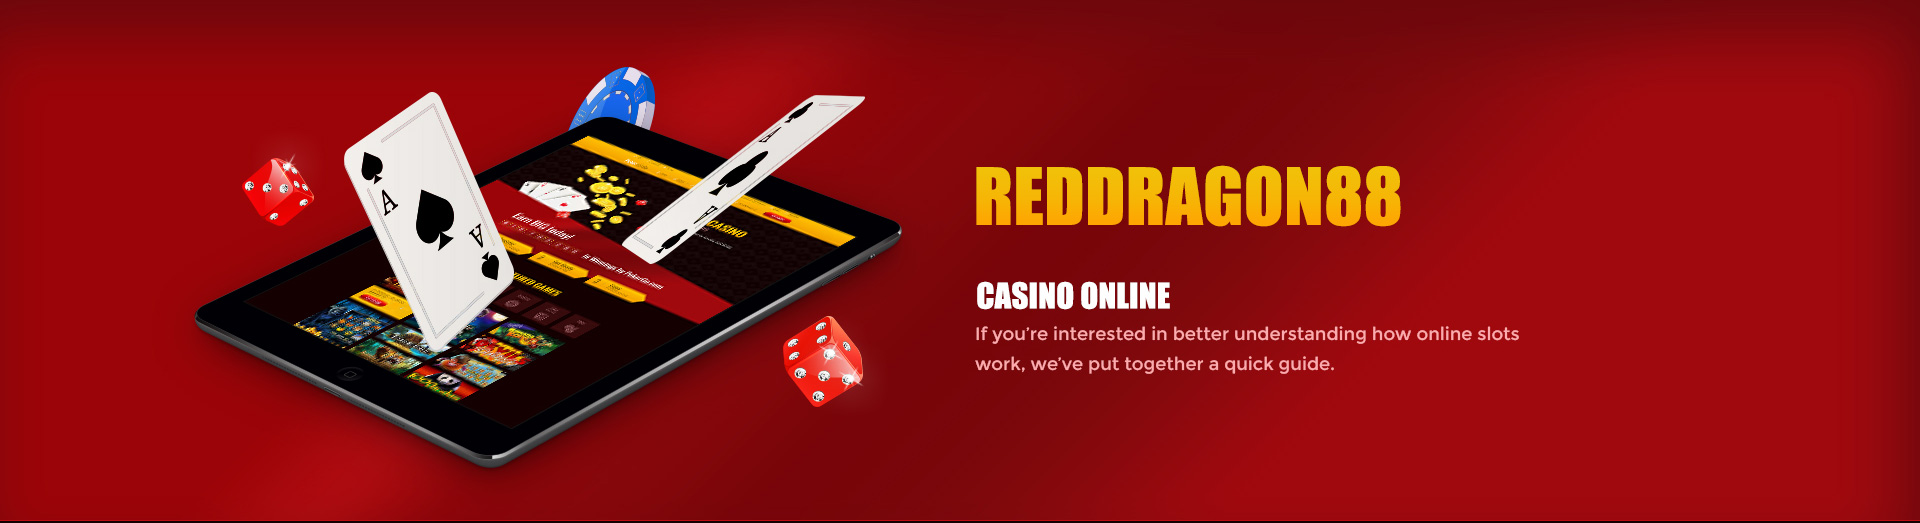 reddragon88 casino banner